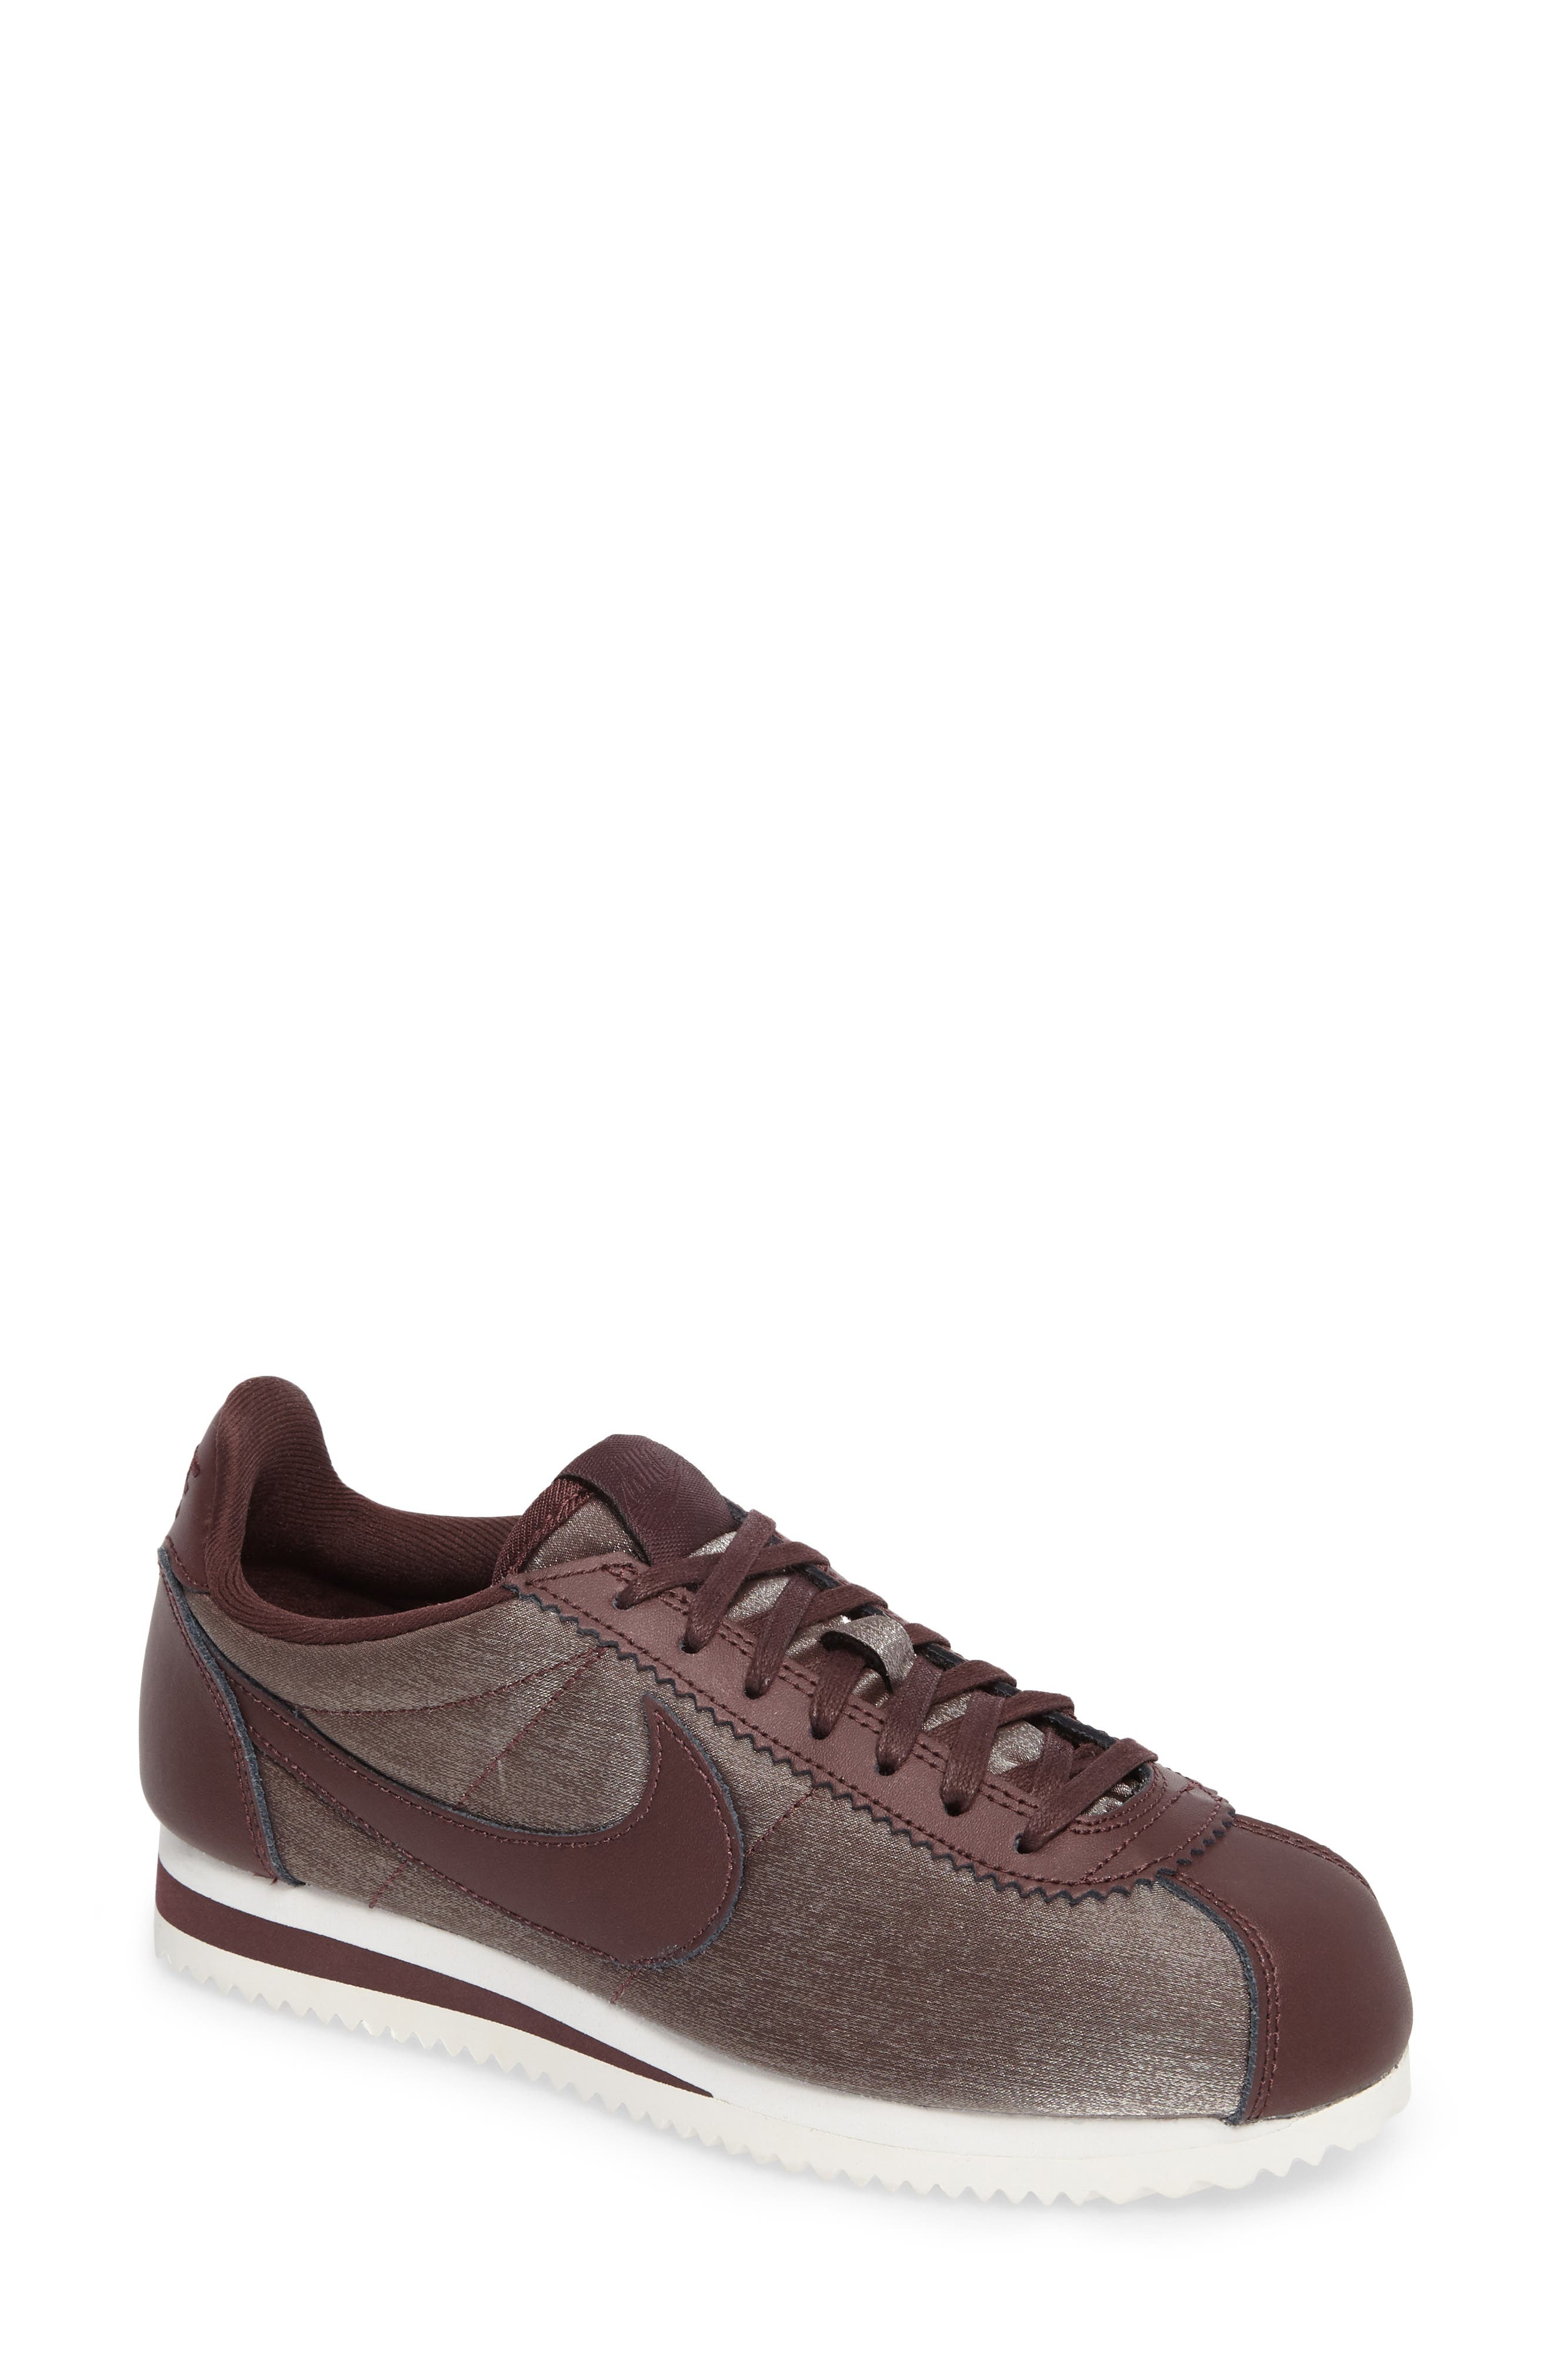 Classic Cortez Premium XLV Sneaker,                             Main thumbnail 1, color,                             Mahogany/ Mahogany/ White